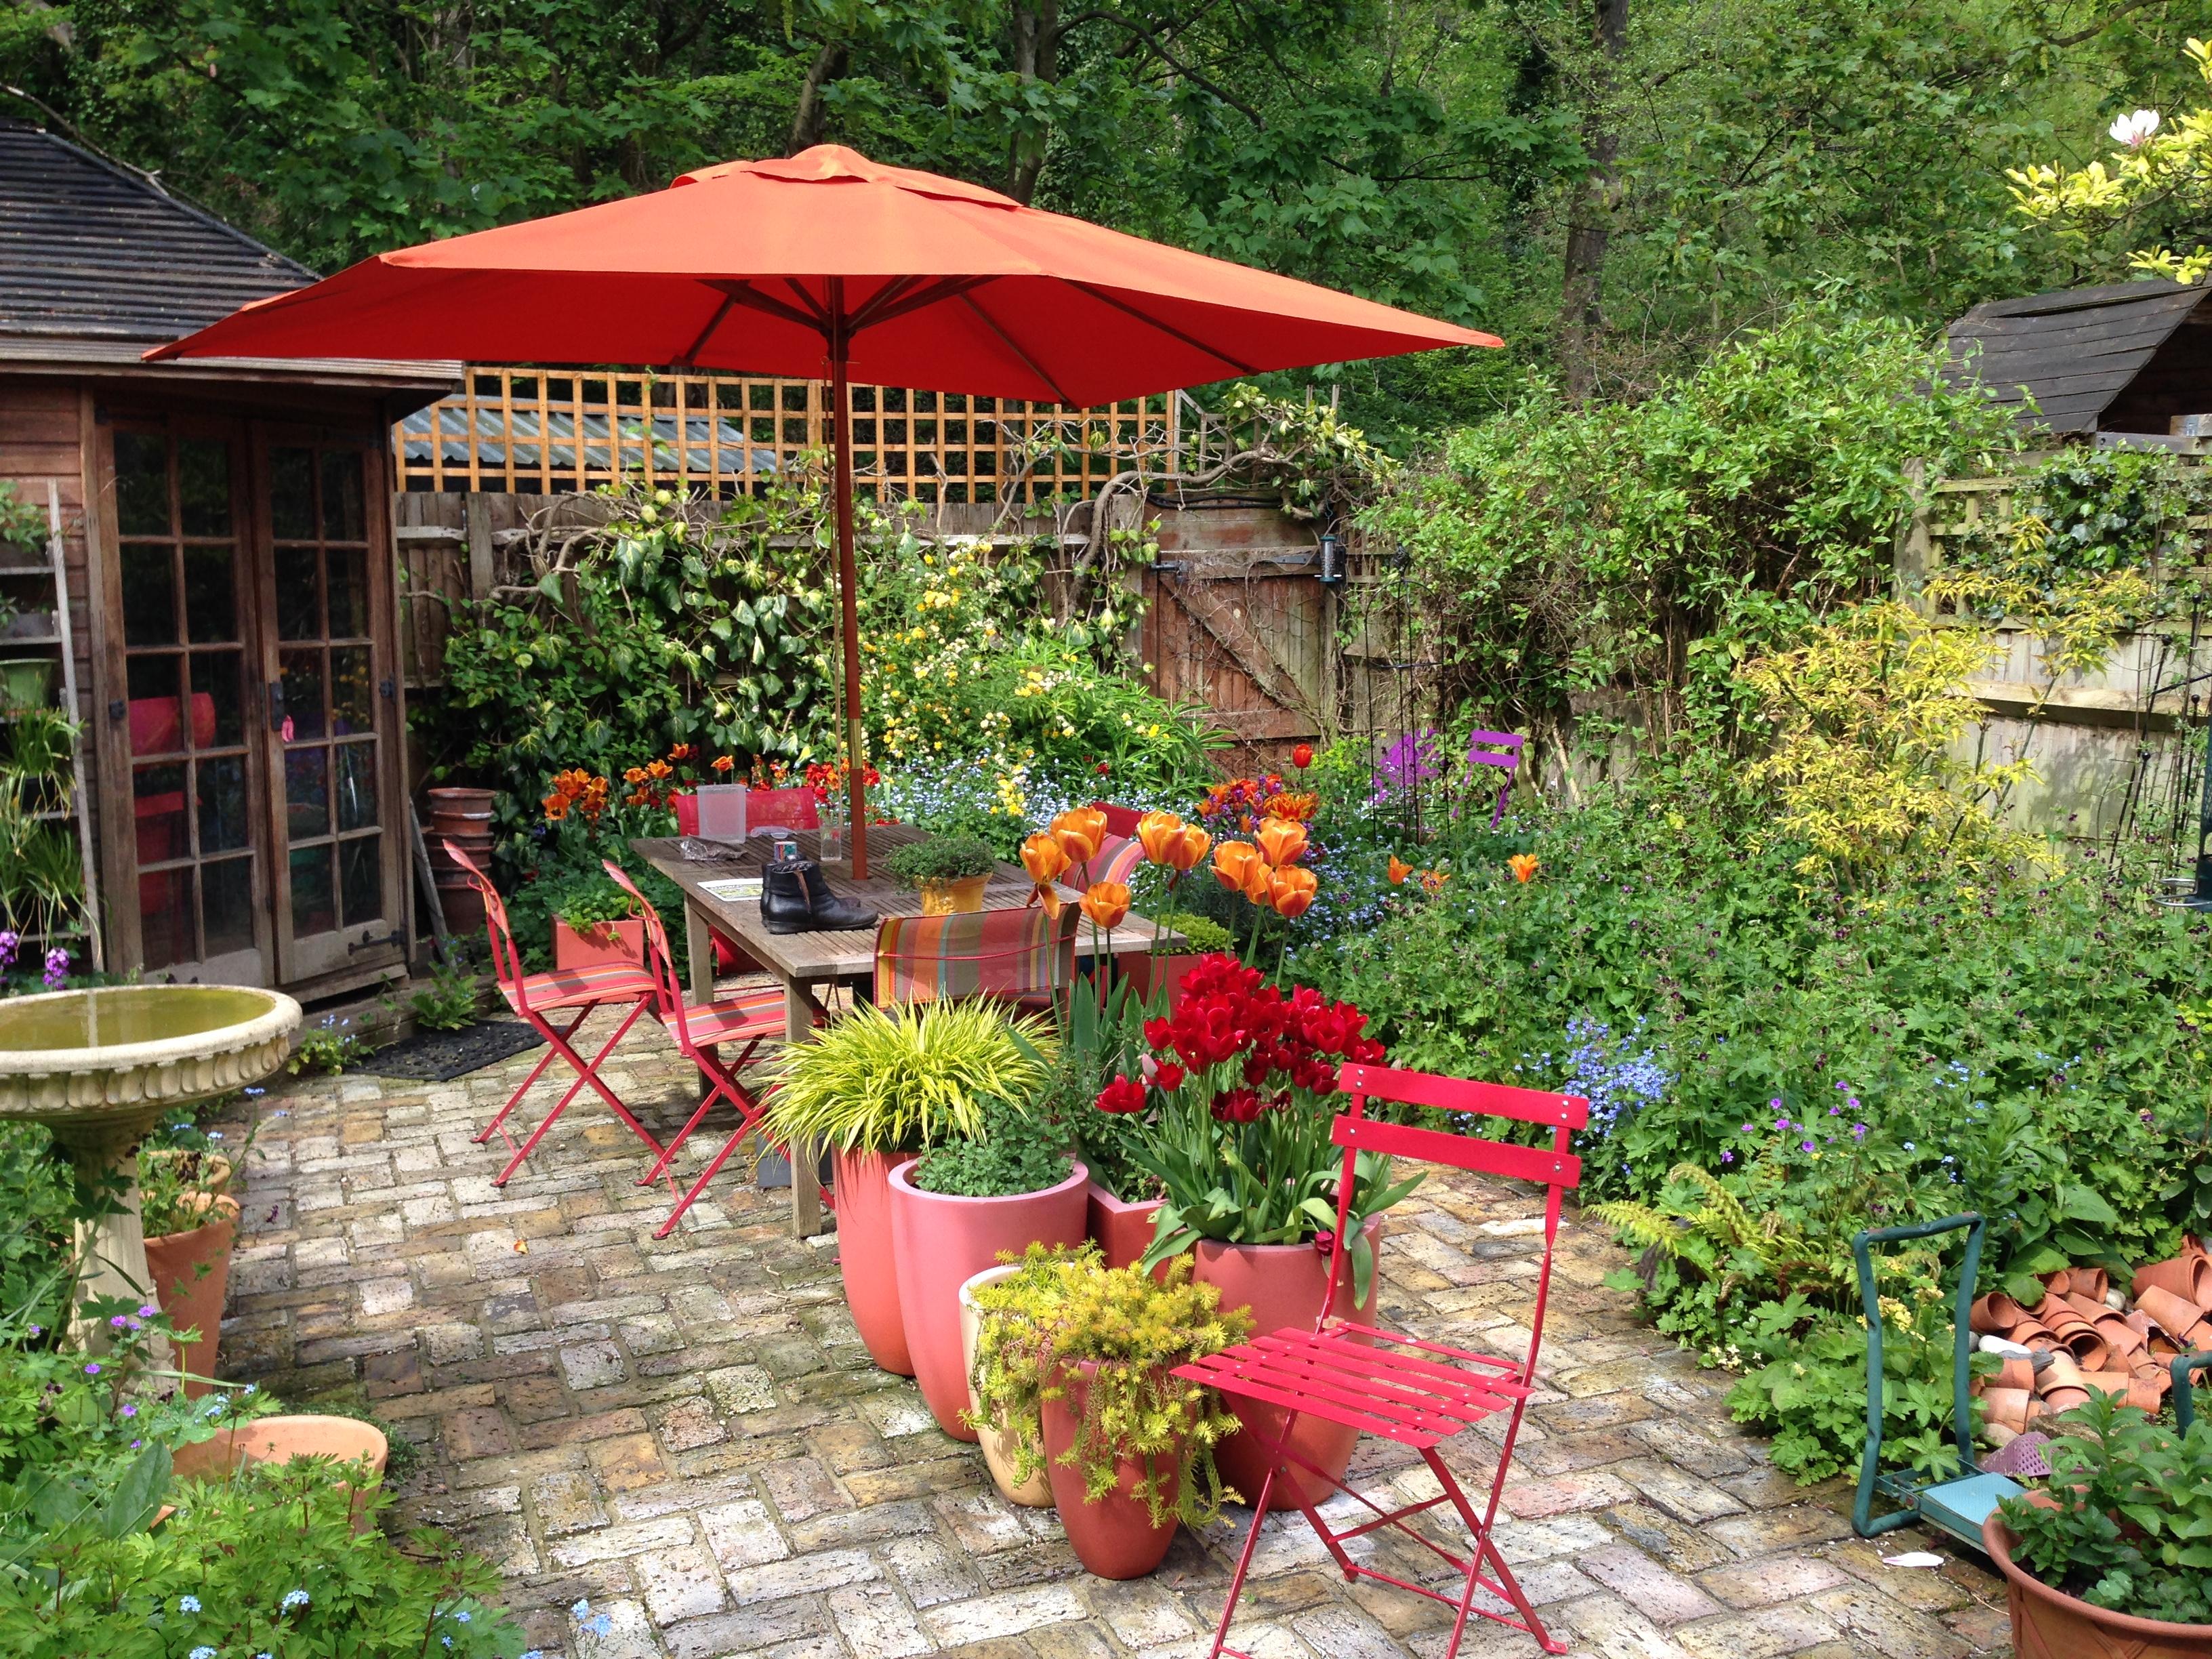 Red and orange in cottage garden furniture